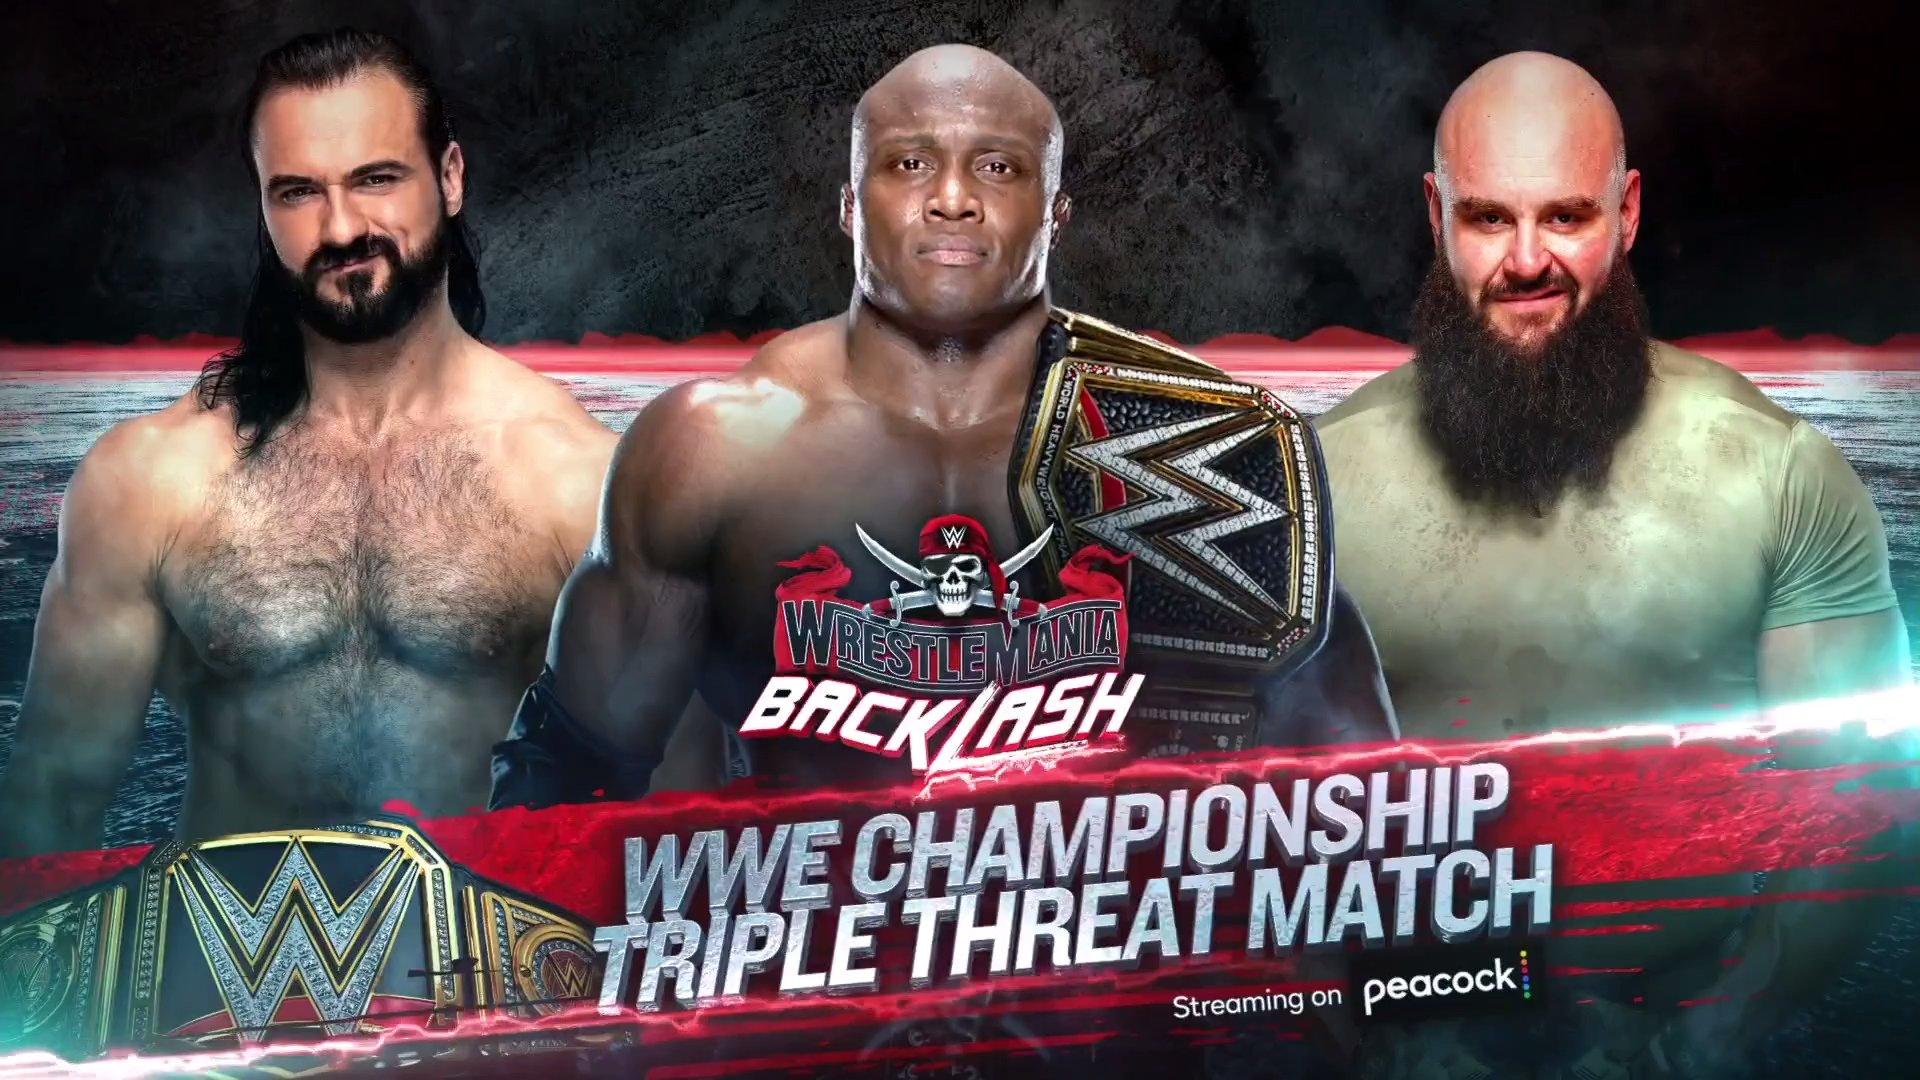 WWE Wrestlemania Backlash 2021: Spoiler On Match Outcomes 88